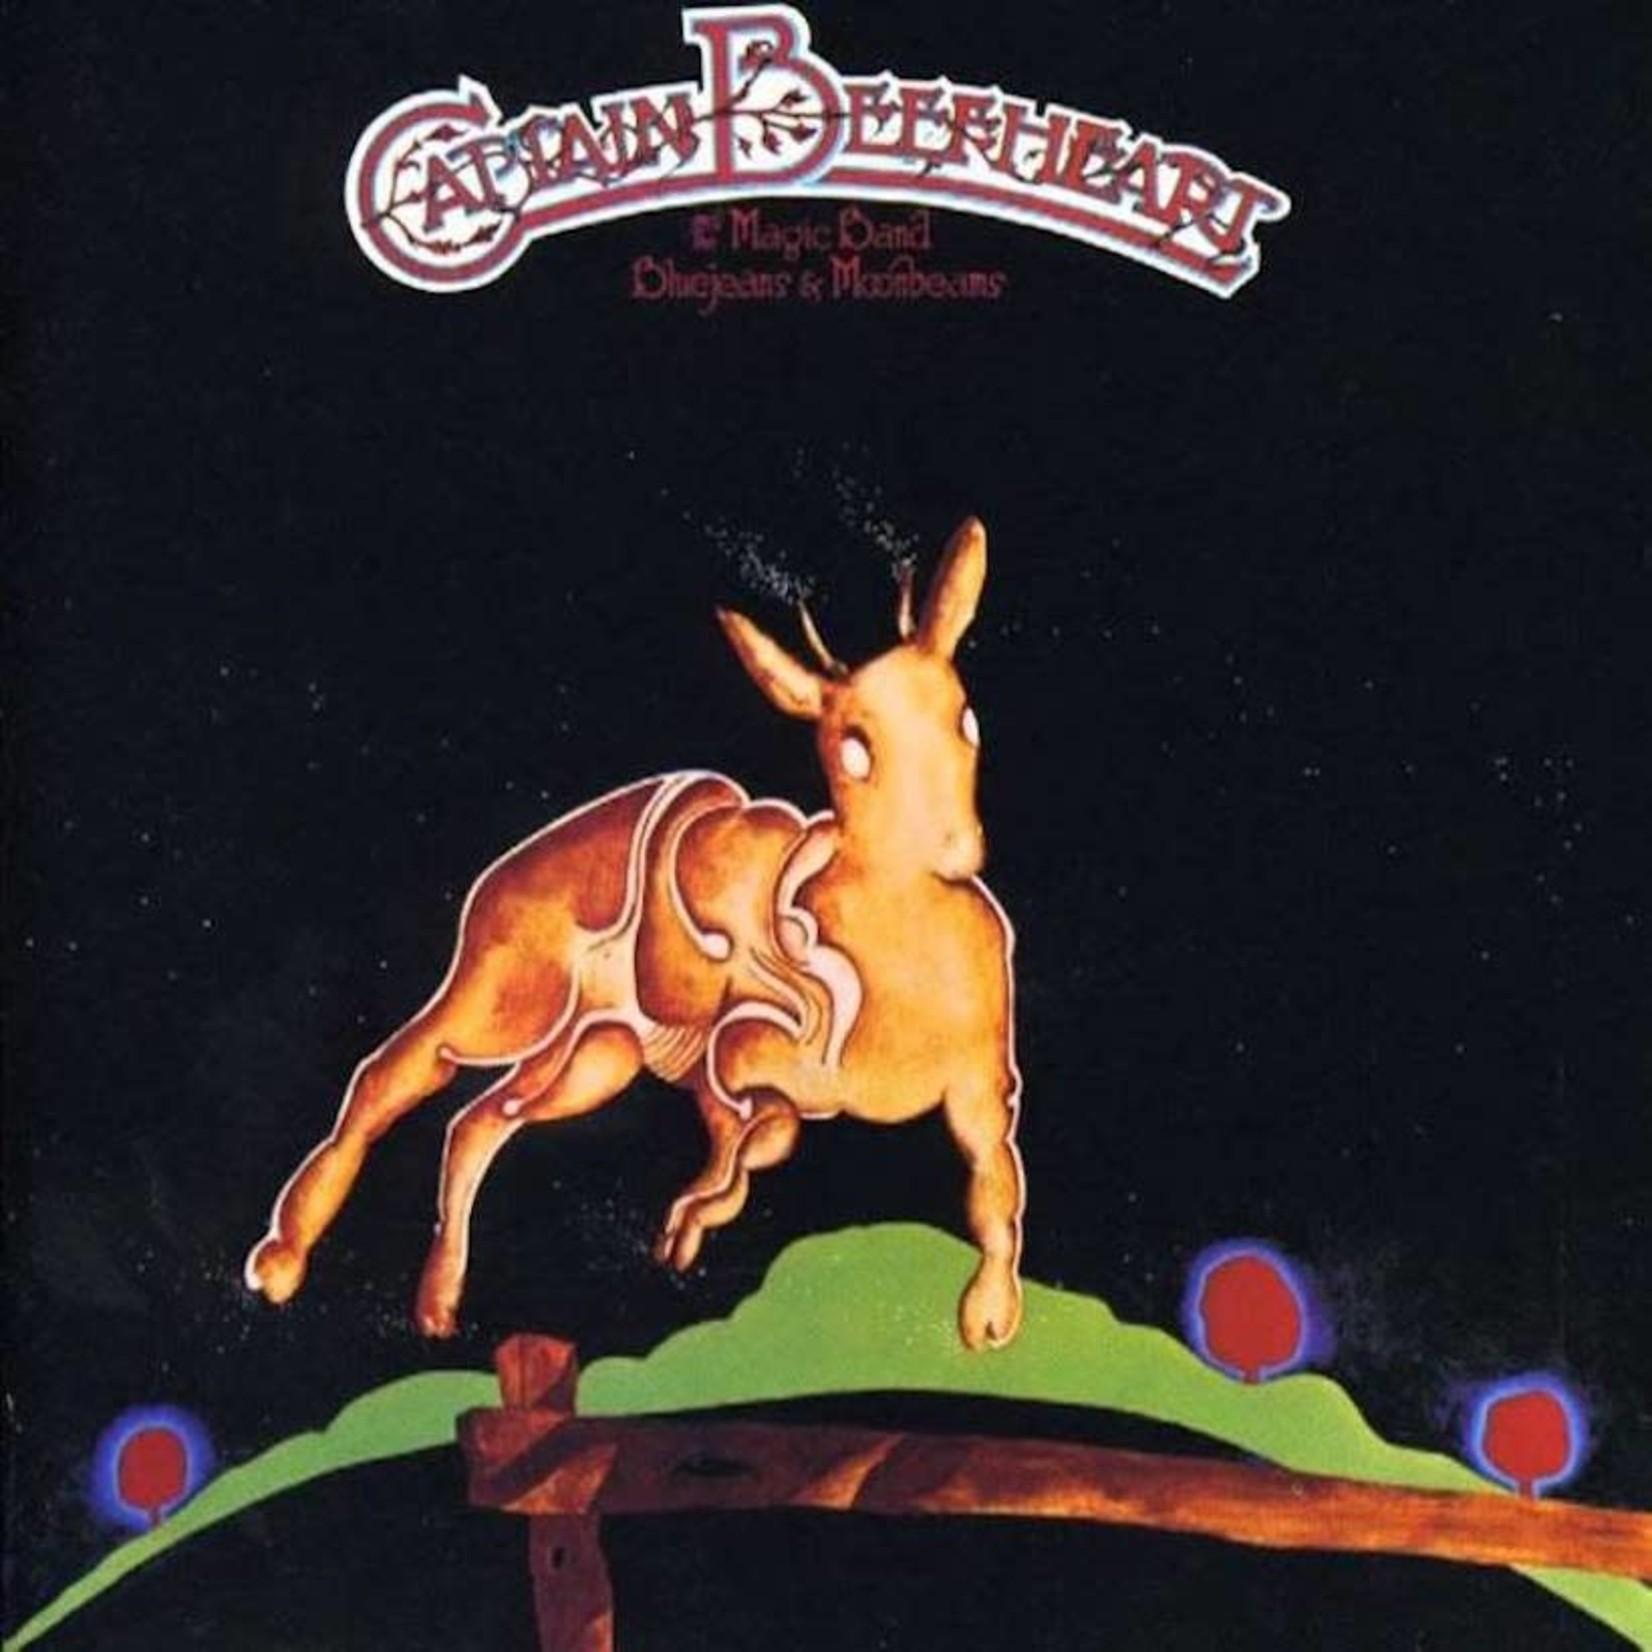 Vinyl Captain Beefheart - Bluejeans & Moonbeams